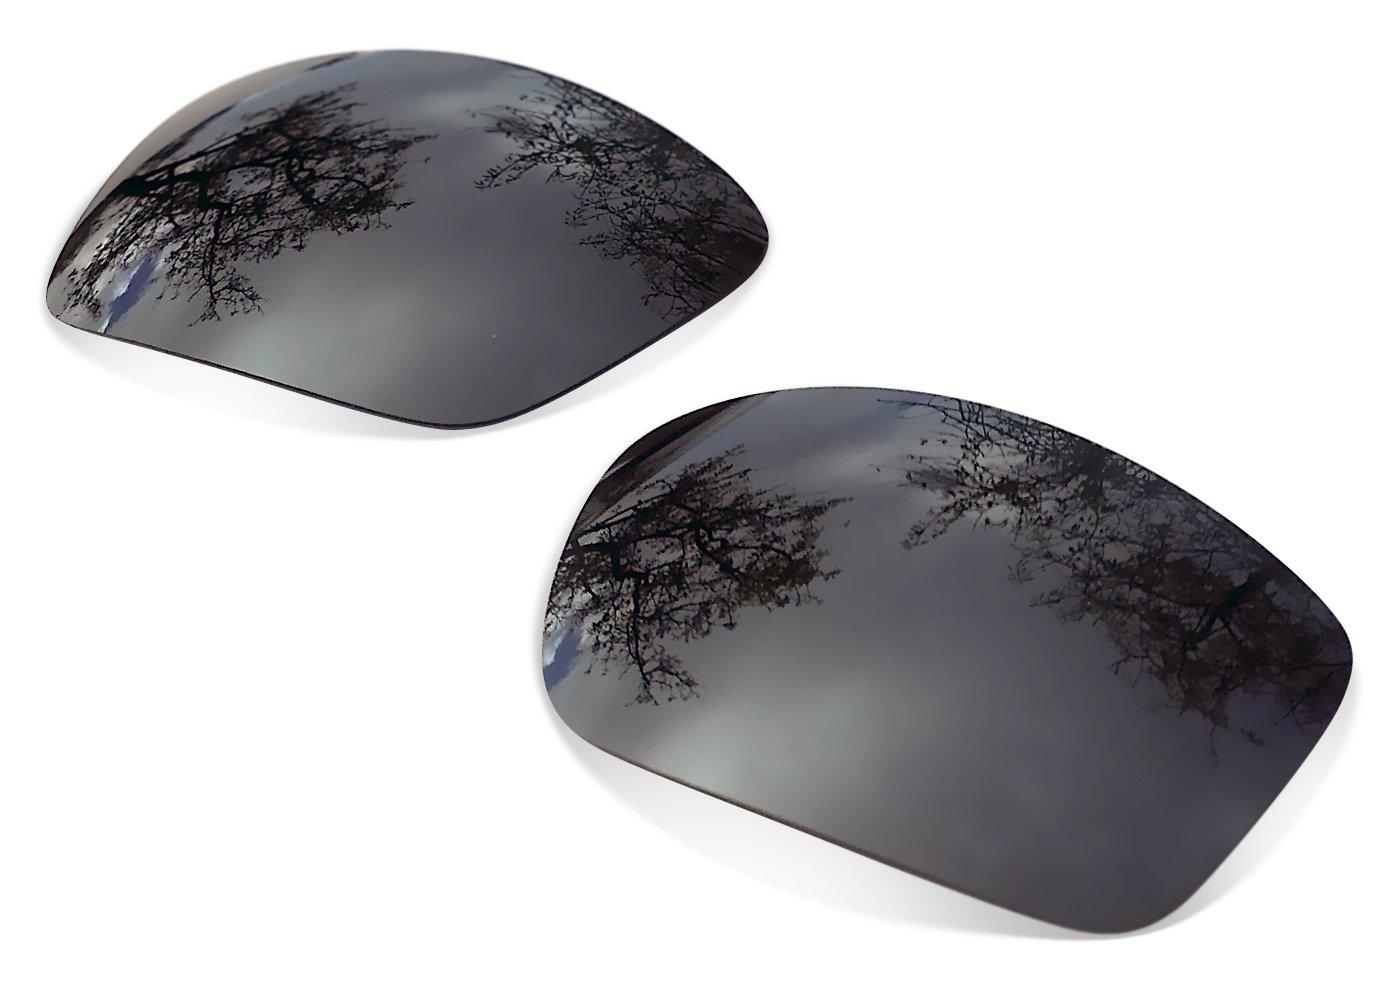 Sunglasses Restorer Lentes Polarizadas Black Irirdium para Oakley Hijinx